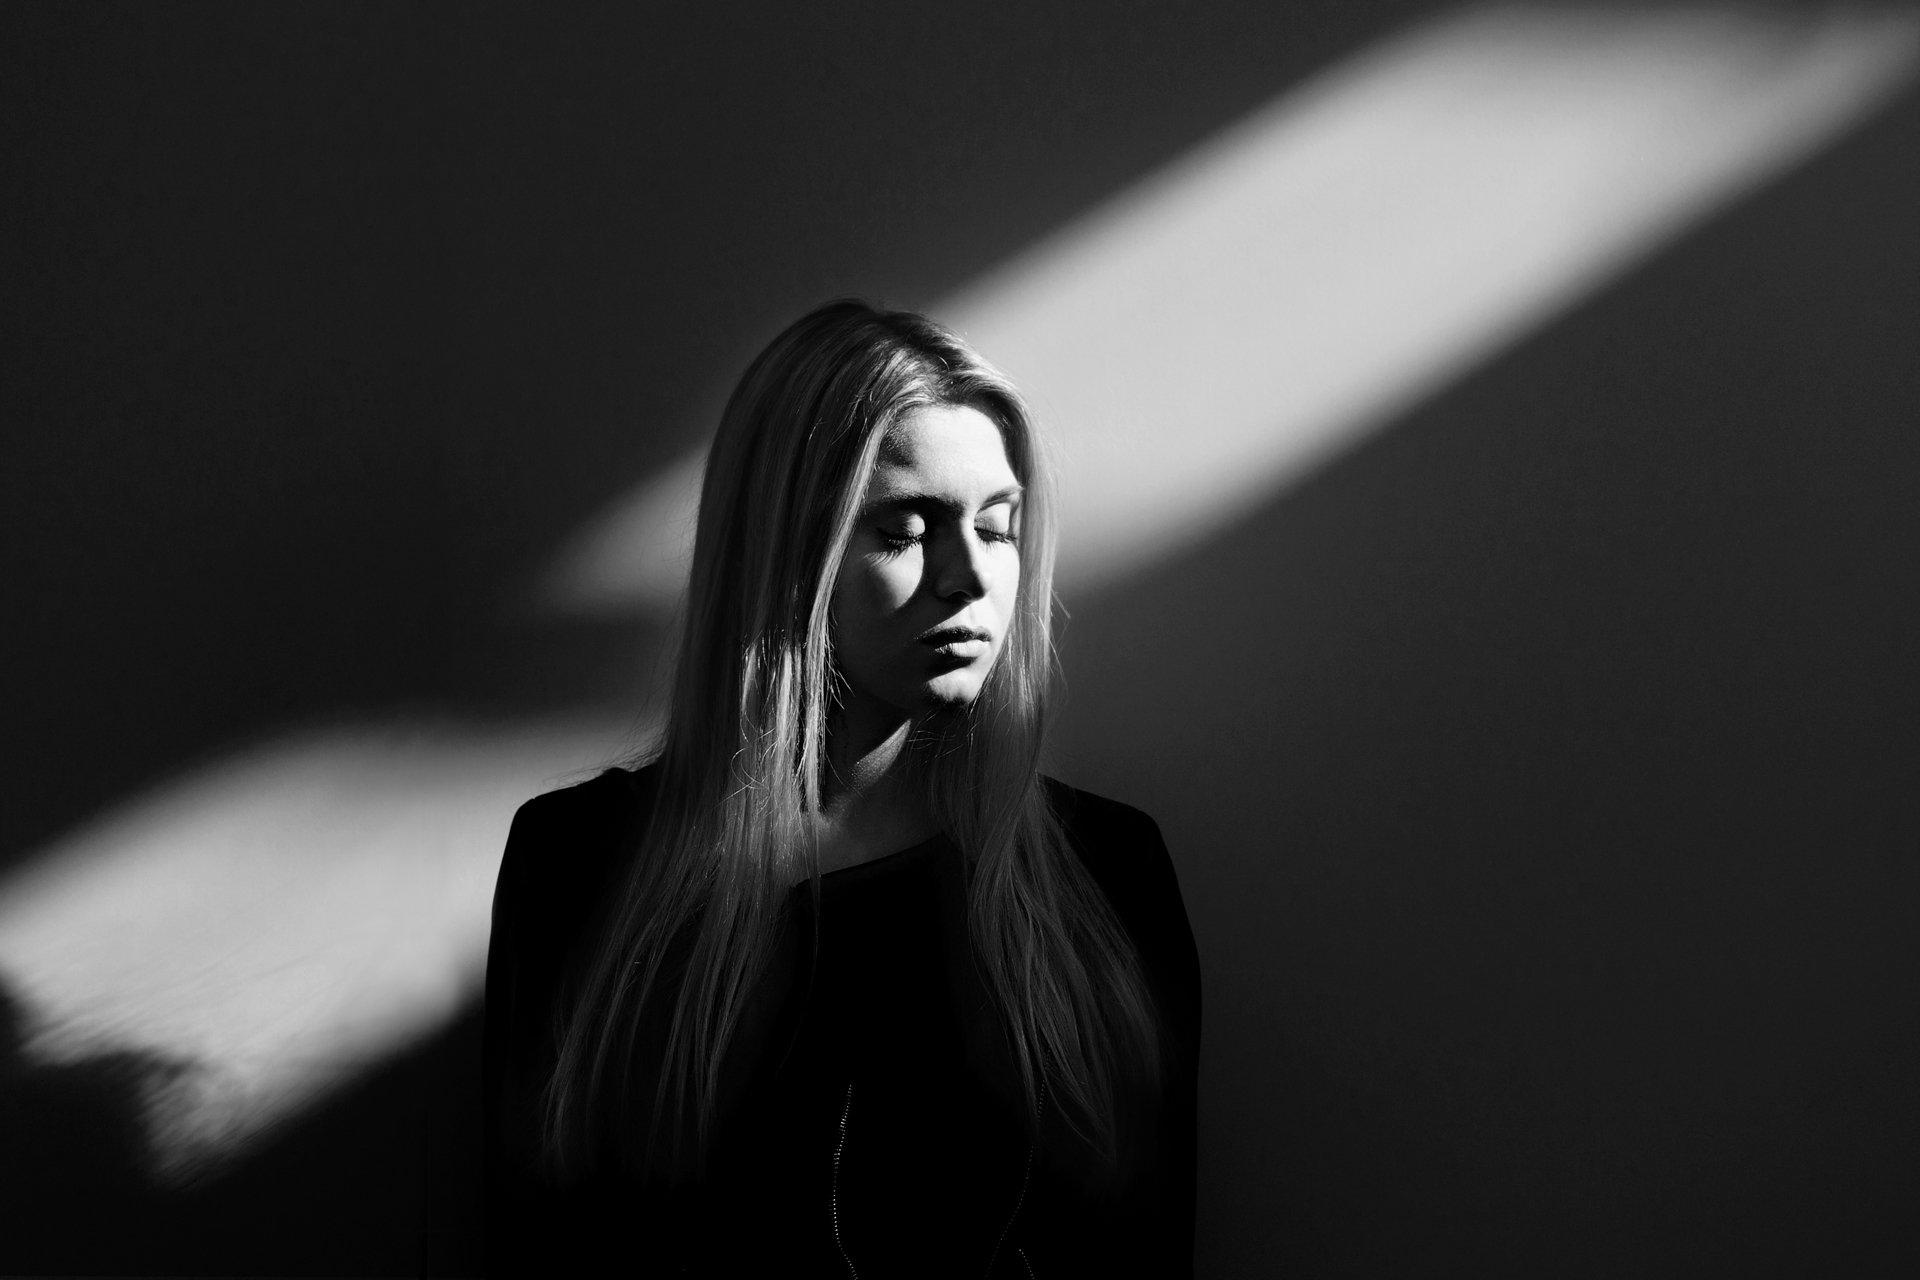 MEET THE LIGHT - Fotografia di Massimiliano Ferrari